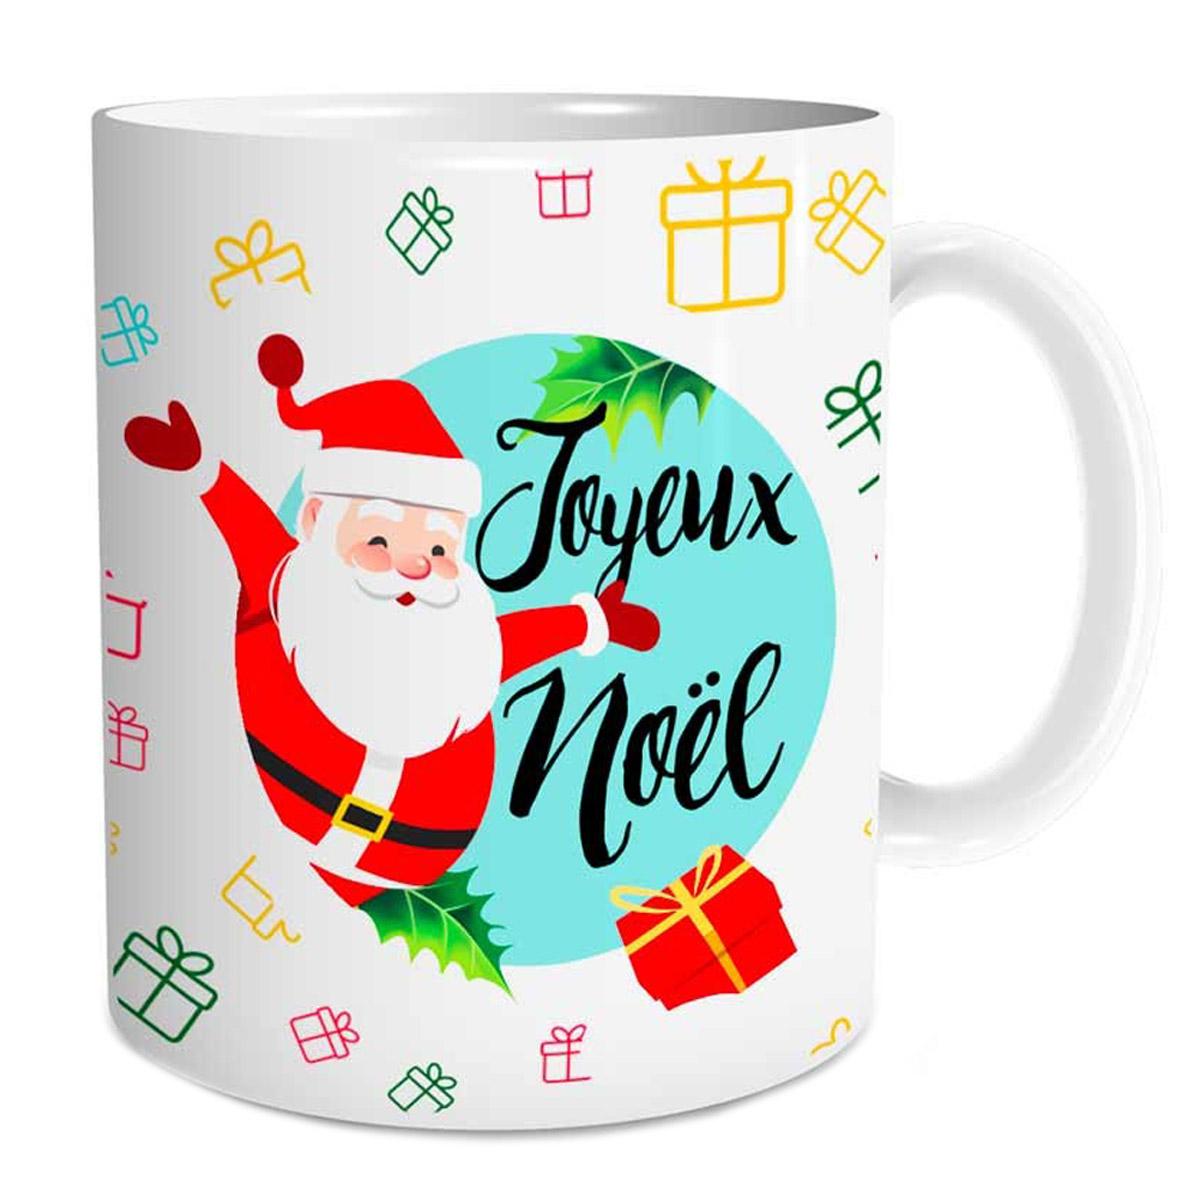 Mug céramique \'Joyeux Noël\' (Père Noël) - 95x8 cm - [Q3558]